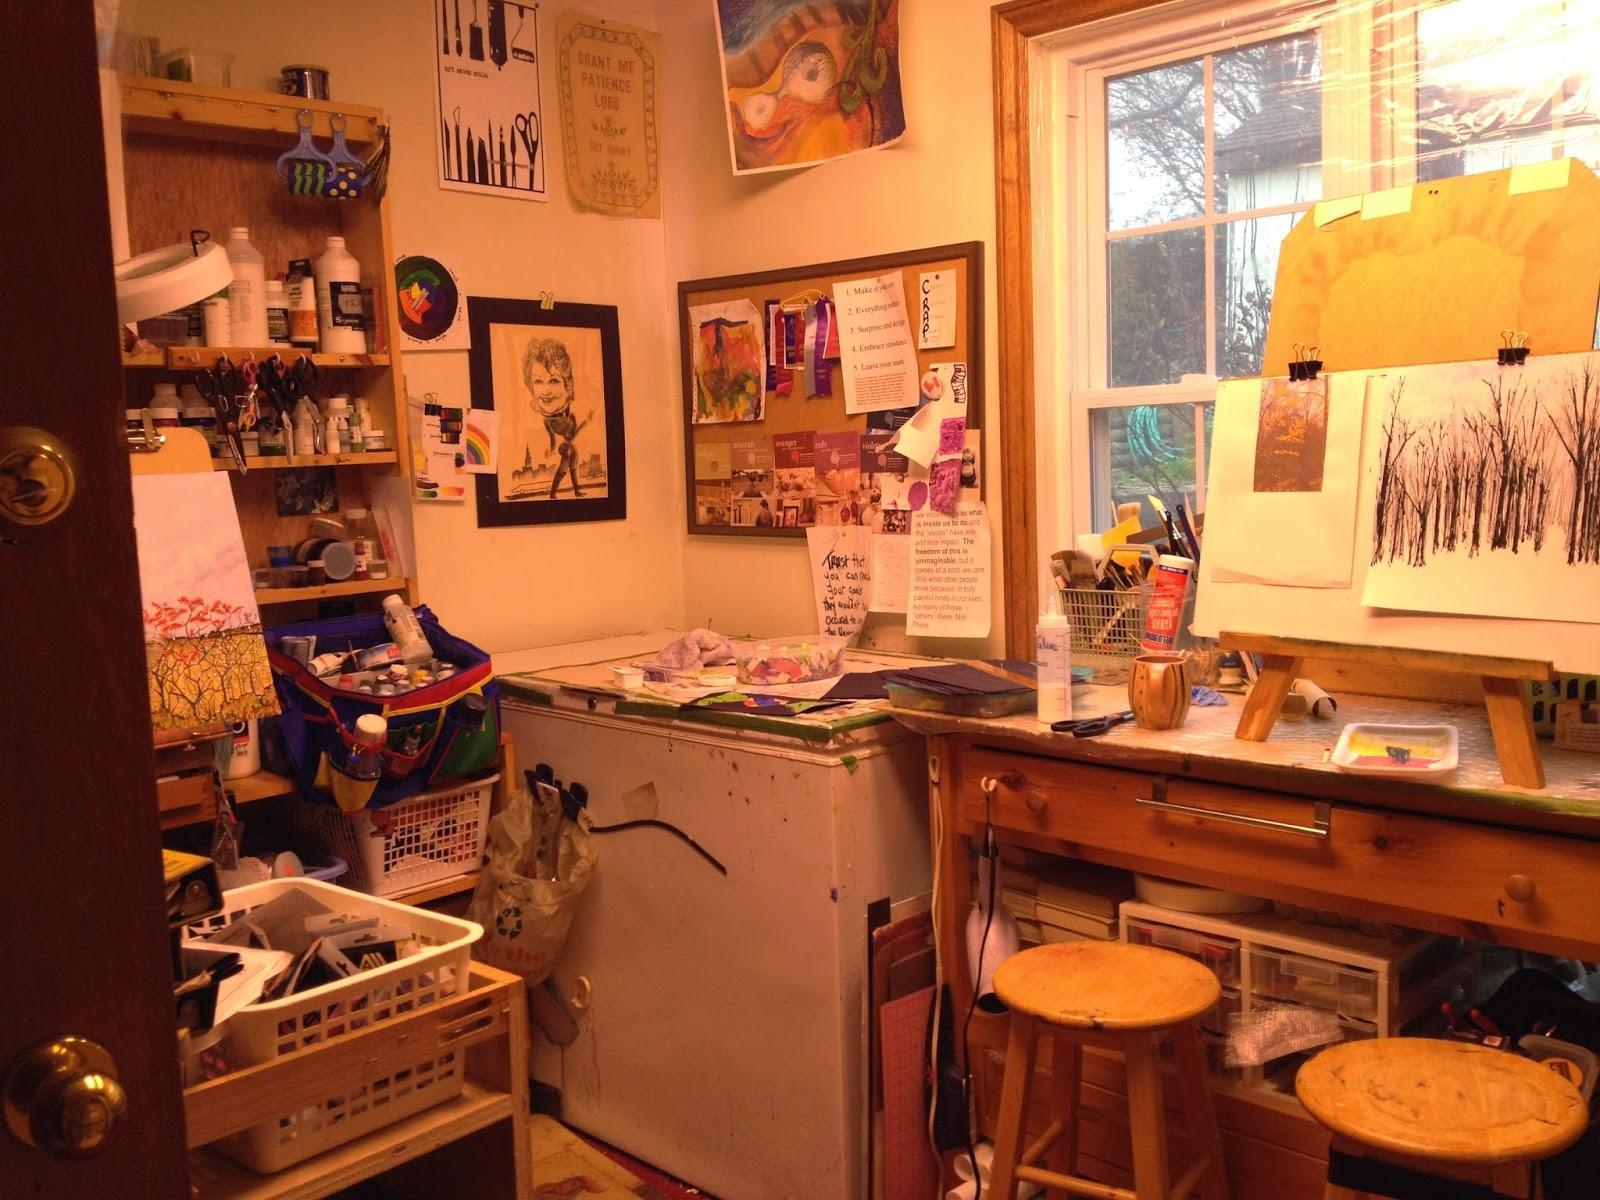 artists studio, Robin Baratta, Belmont Ontario Canada